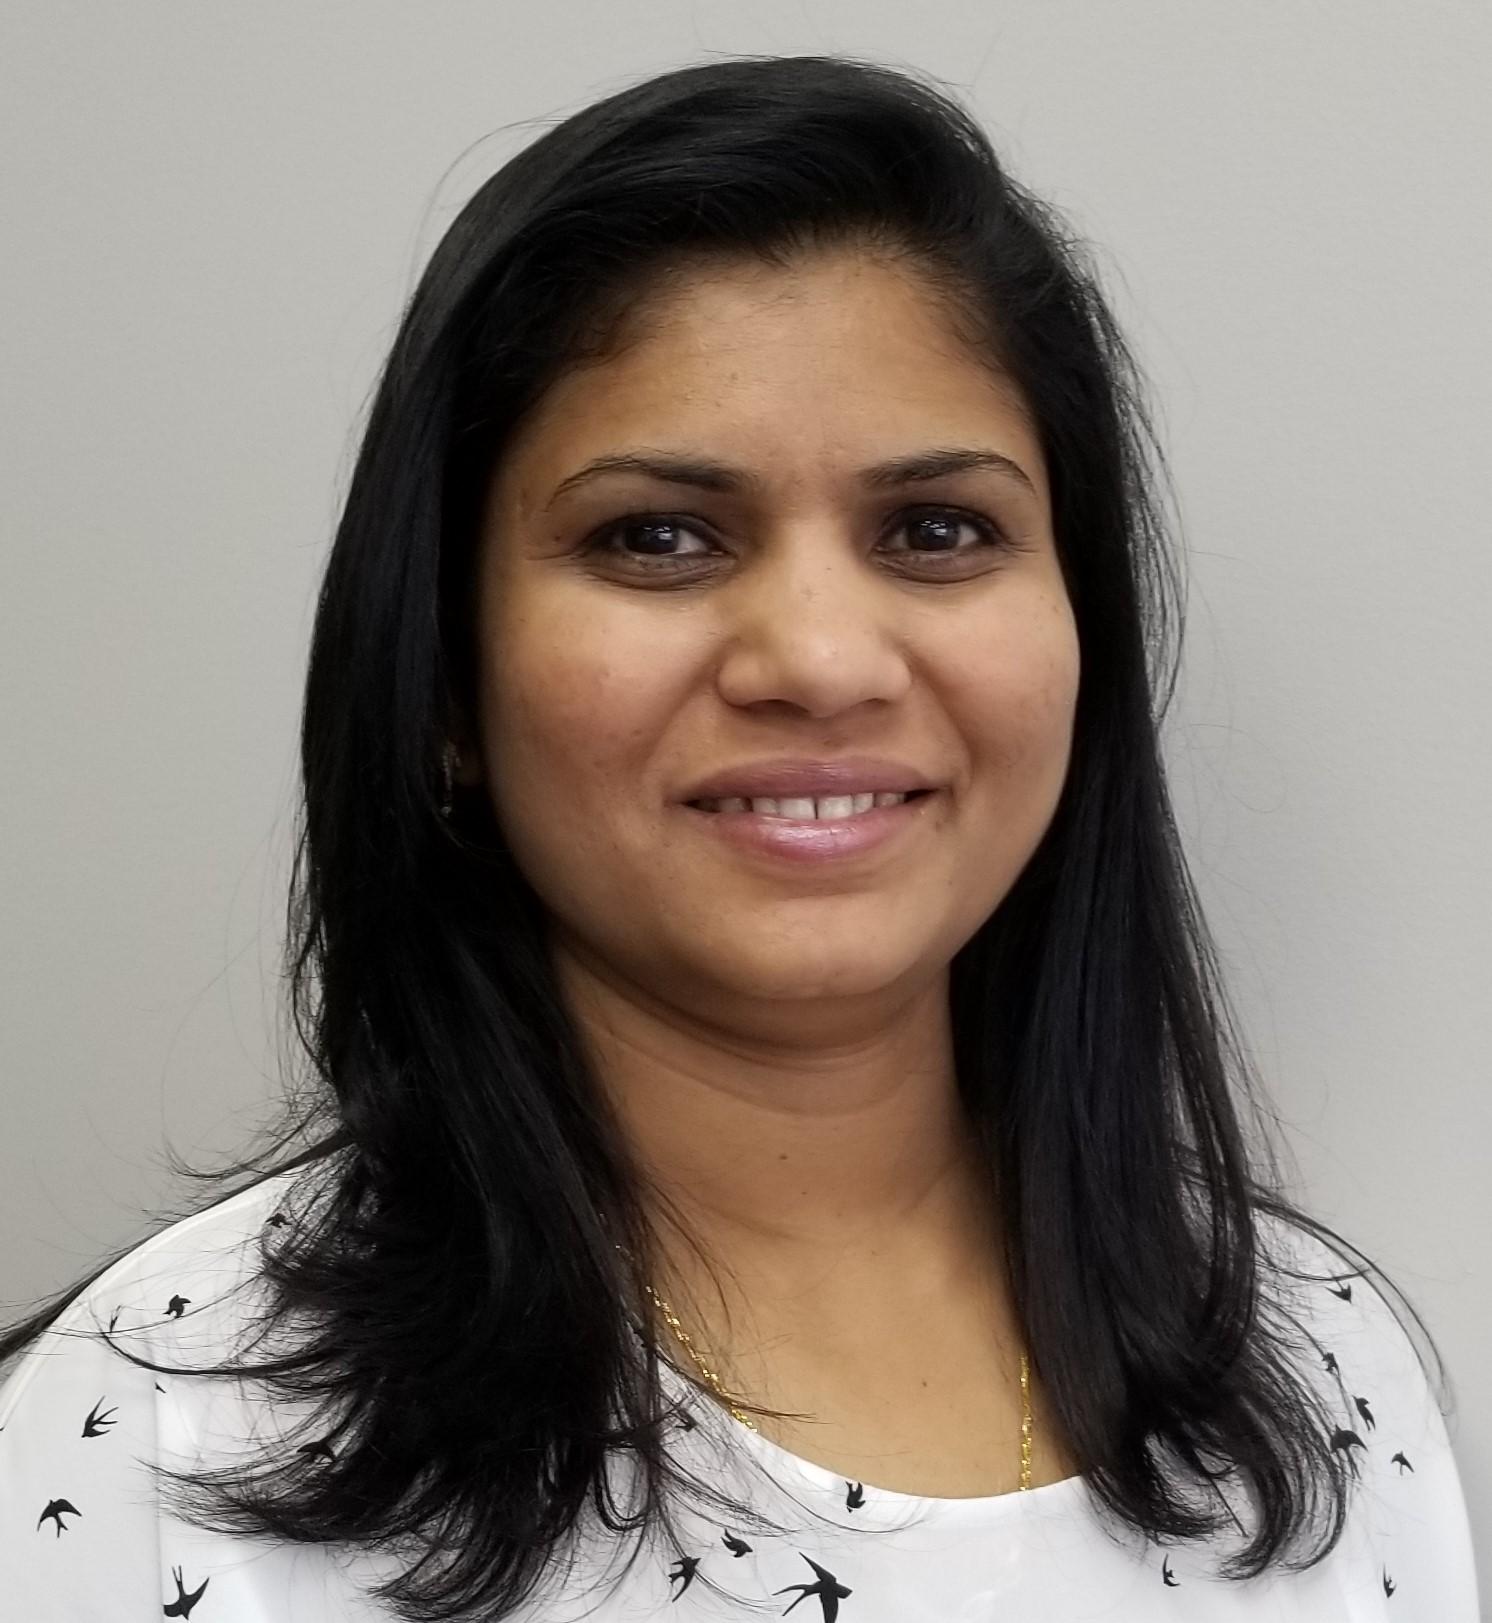 Cynthia Profile Image